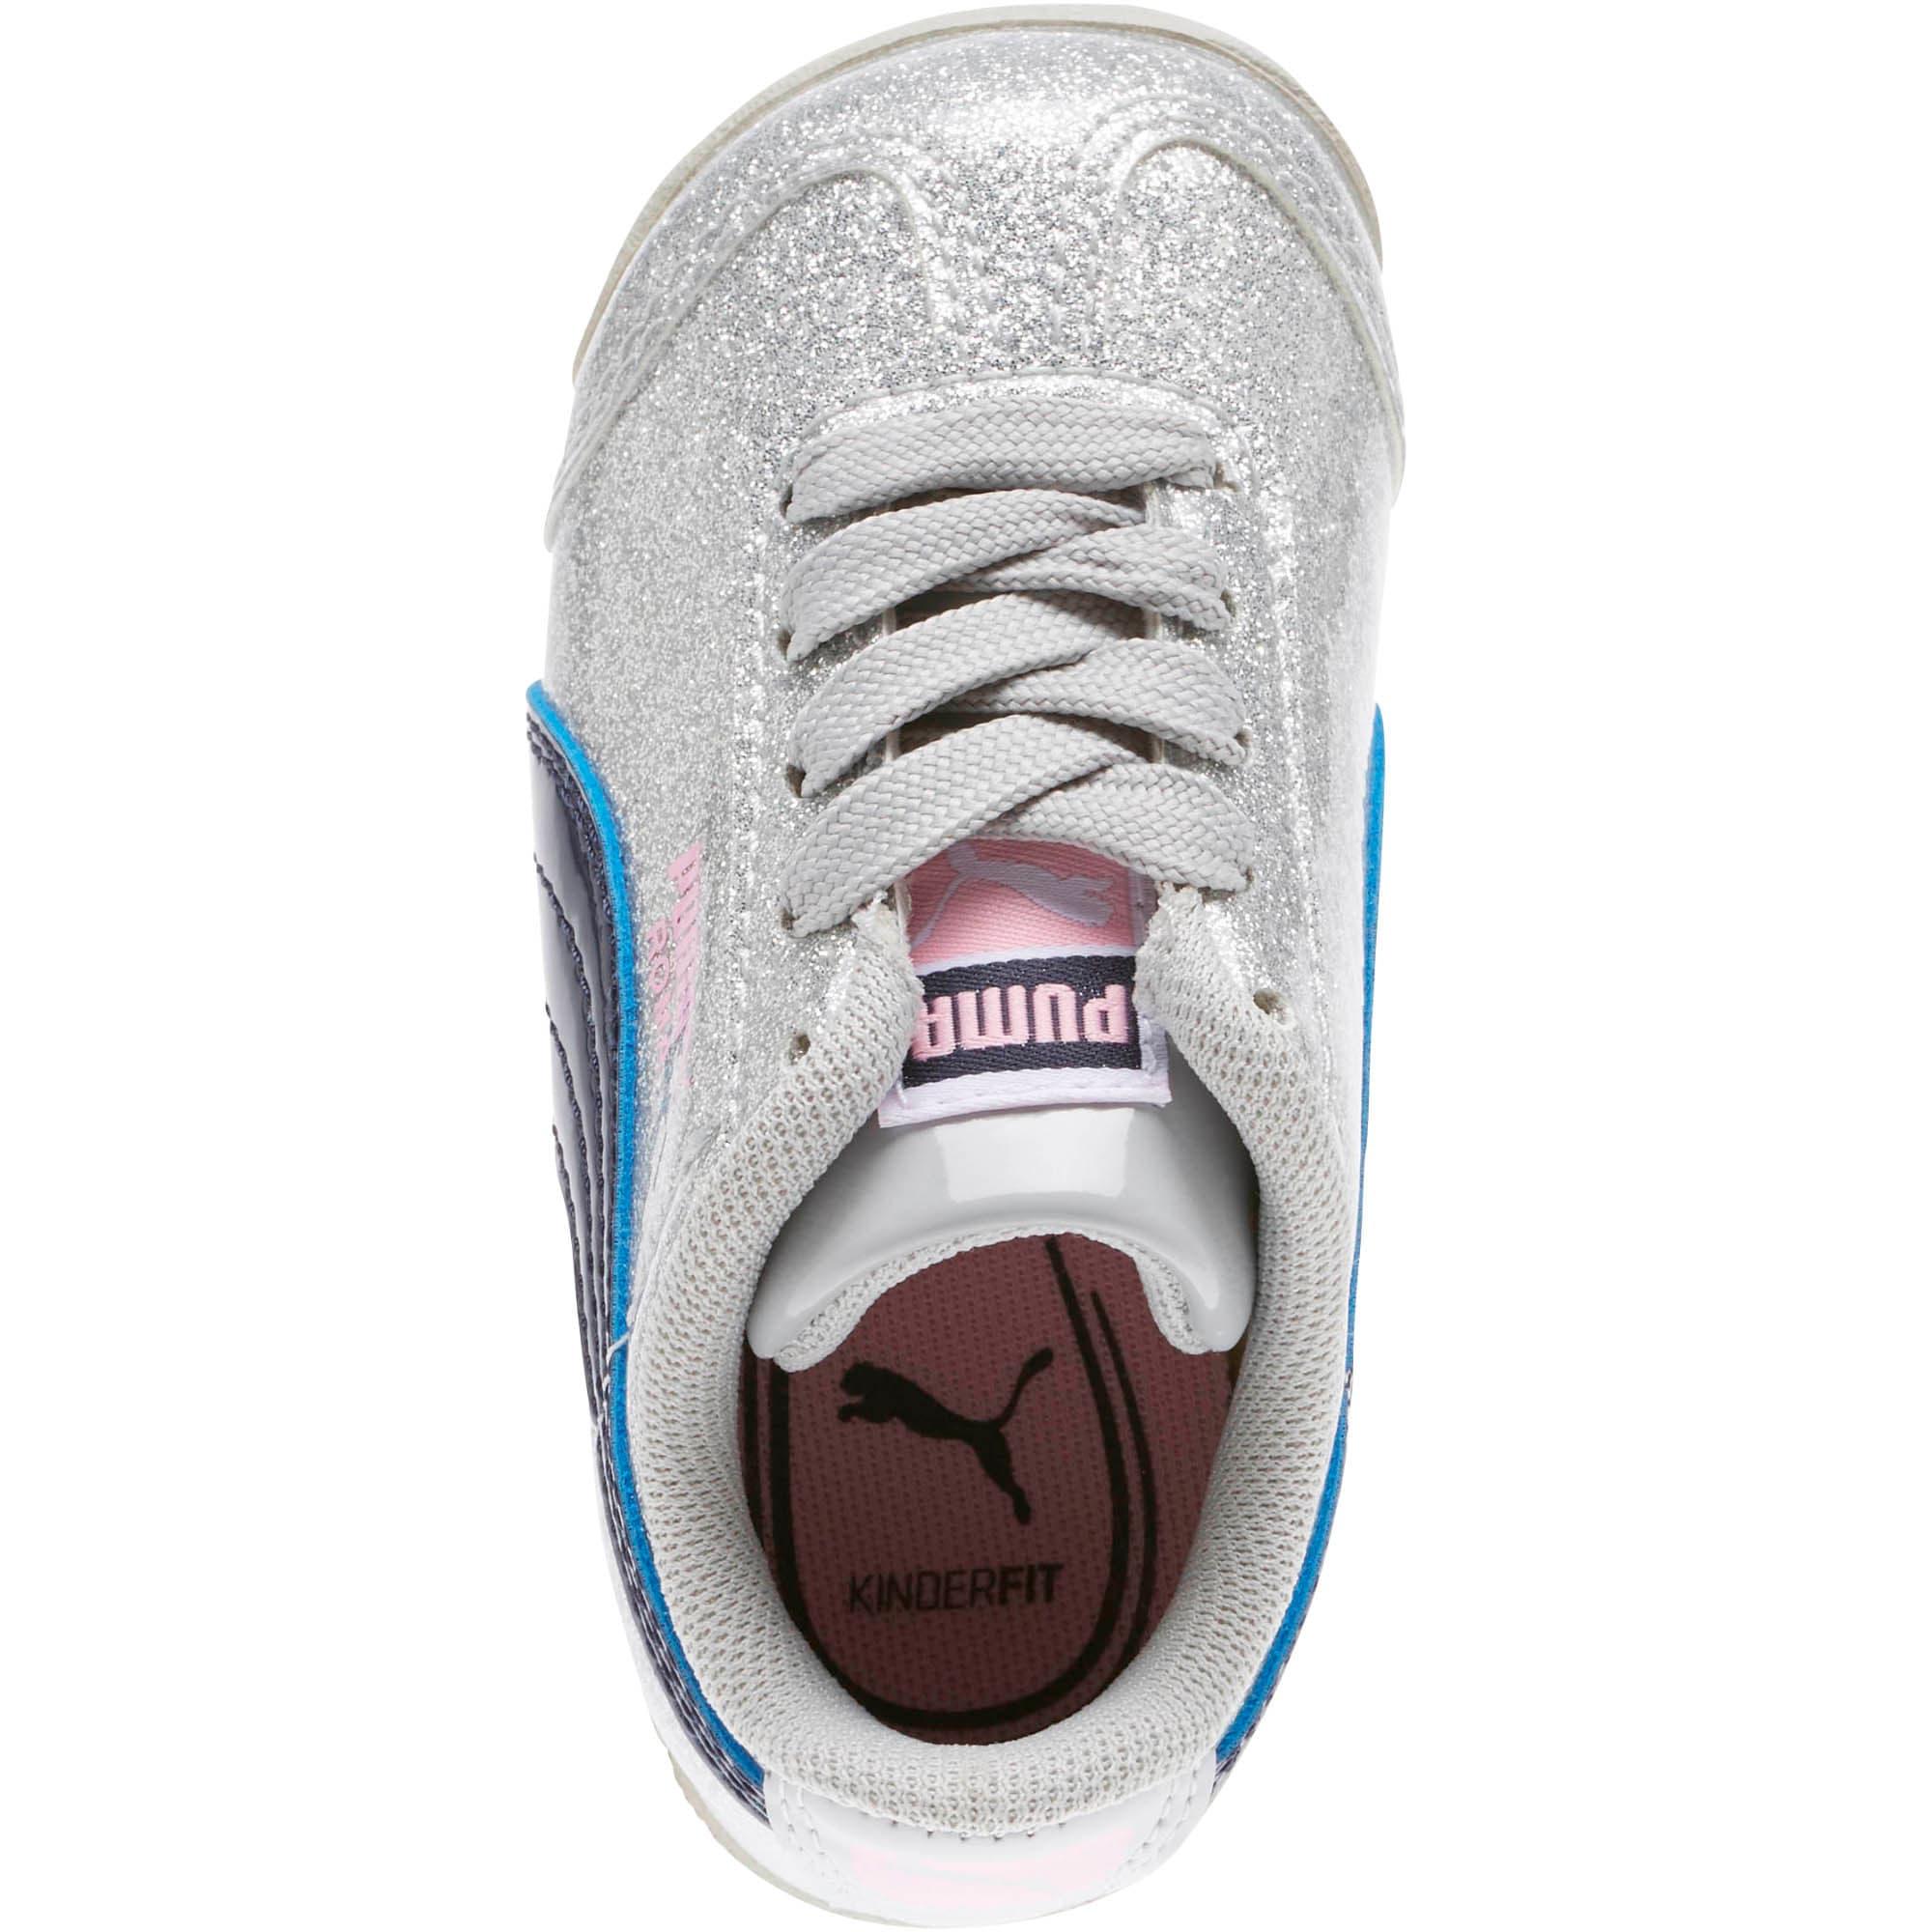 Thumbnail 5 of Roma Glam INF Shoes, Gray Violet-Peacoat, medium